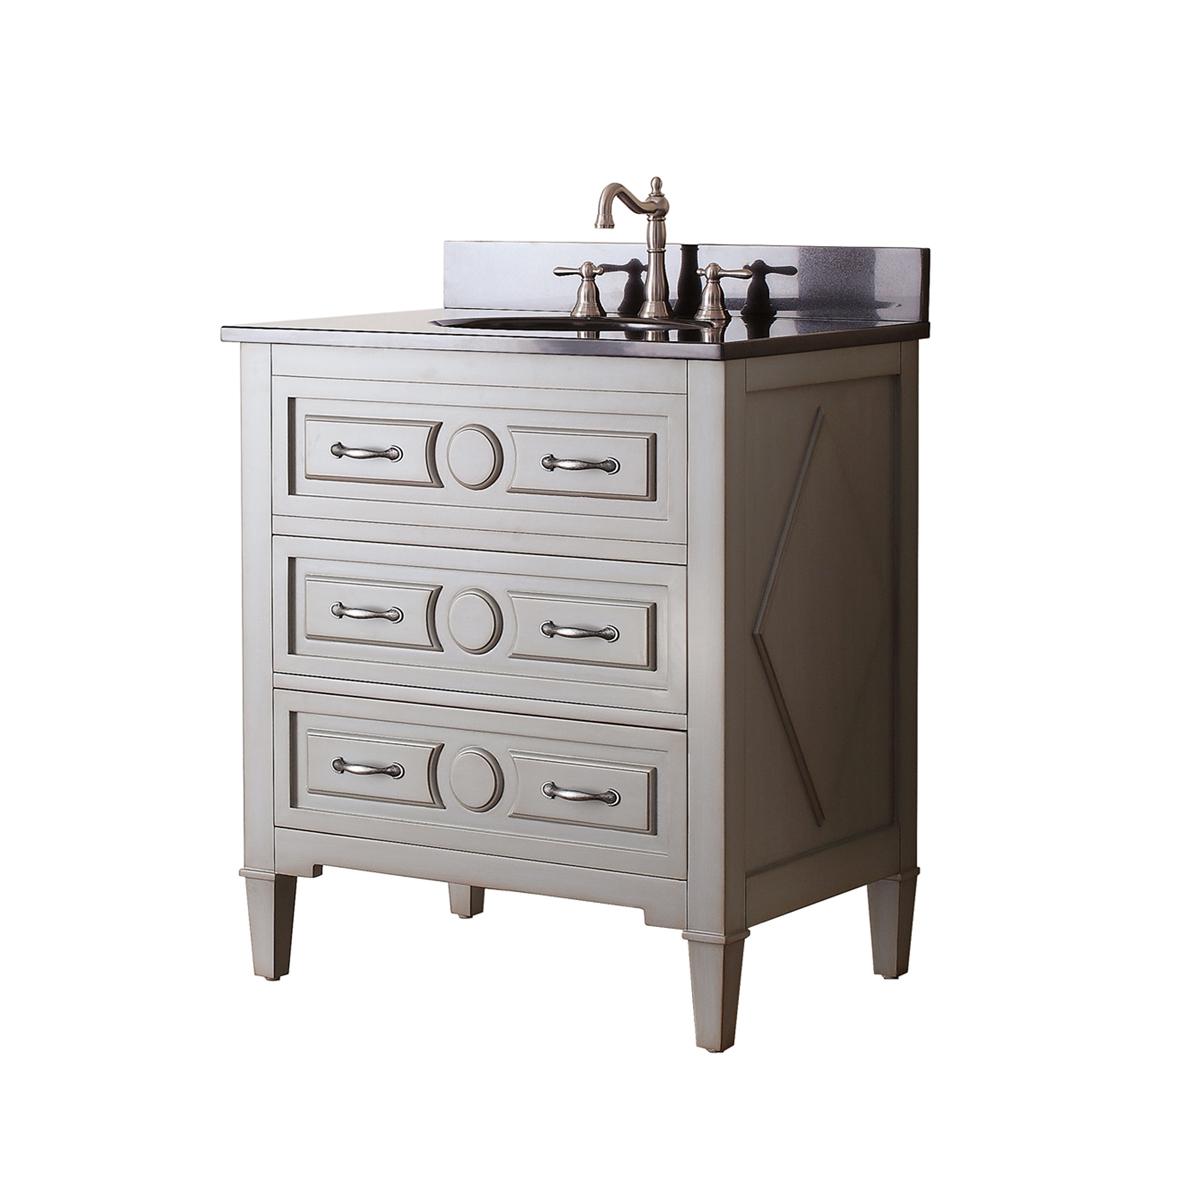 "31"" Worotan Single Bath Vanity - Black Granite Top"